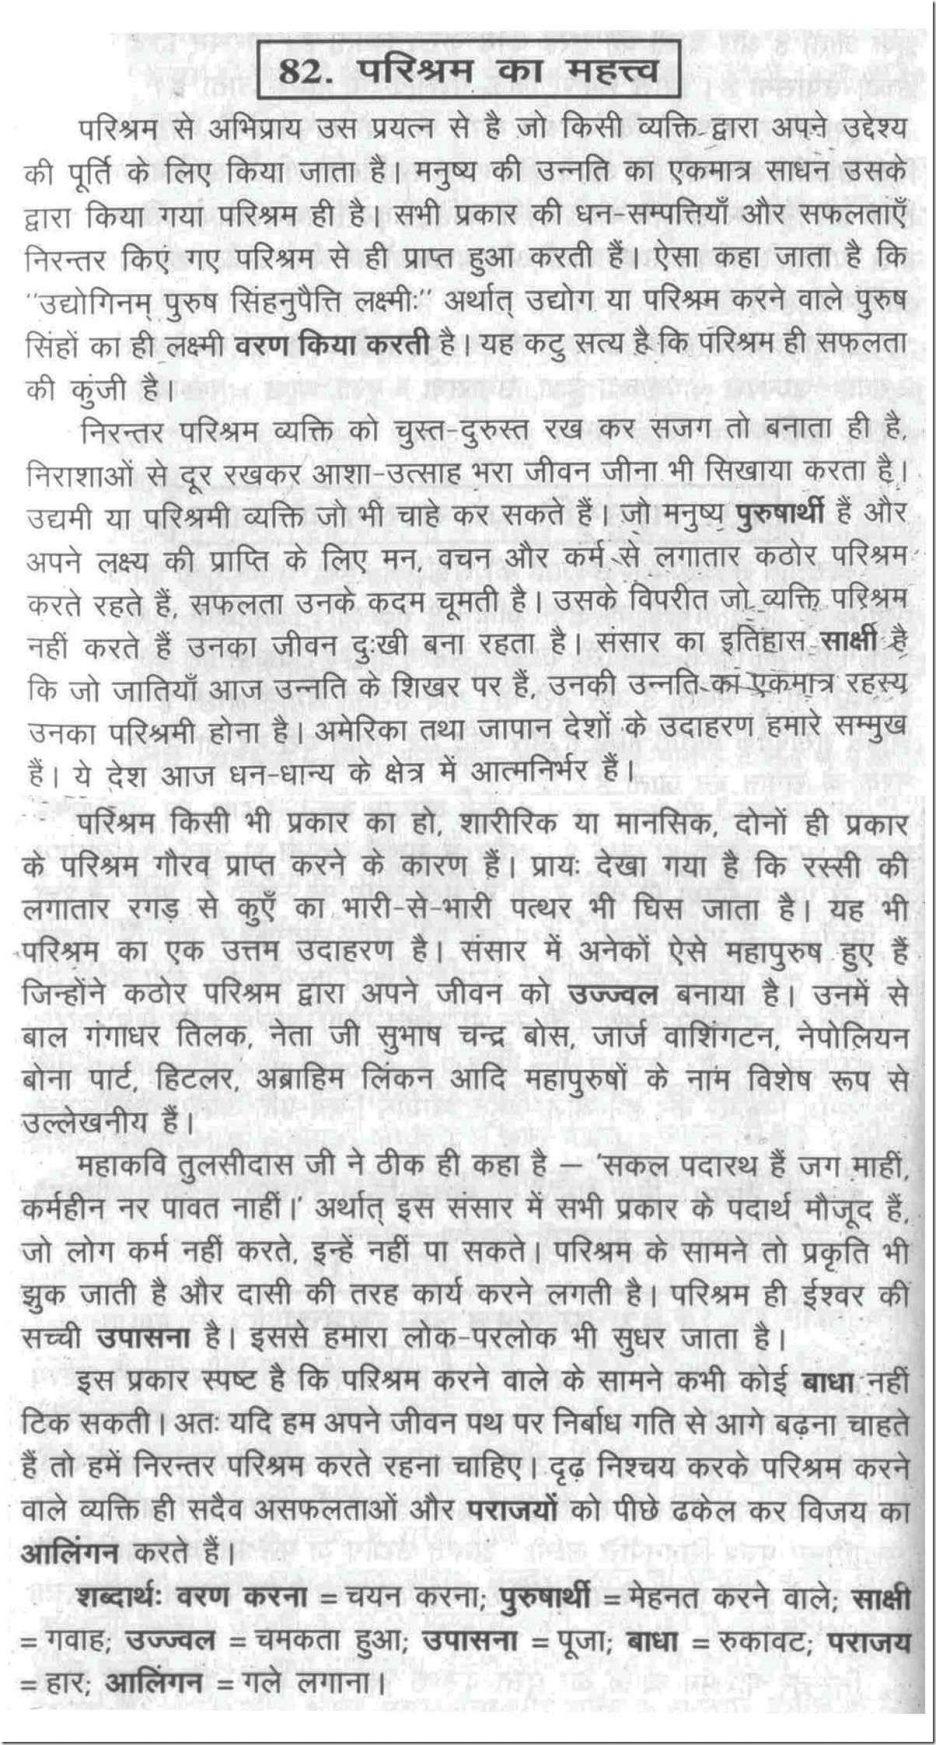 009 Hard Work Essay Thumb On Importance Of Hardwork In Hindi Urdu And Success Determination An Marathi English Is Key To Social Welfare Discourages Language The Punjabi 936x1745 Wonderful Example Full